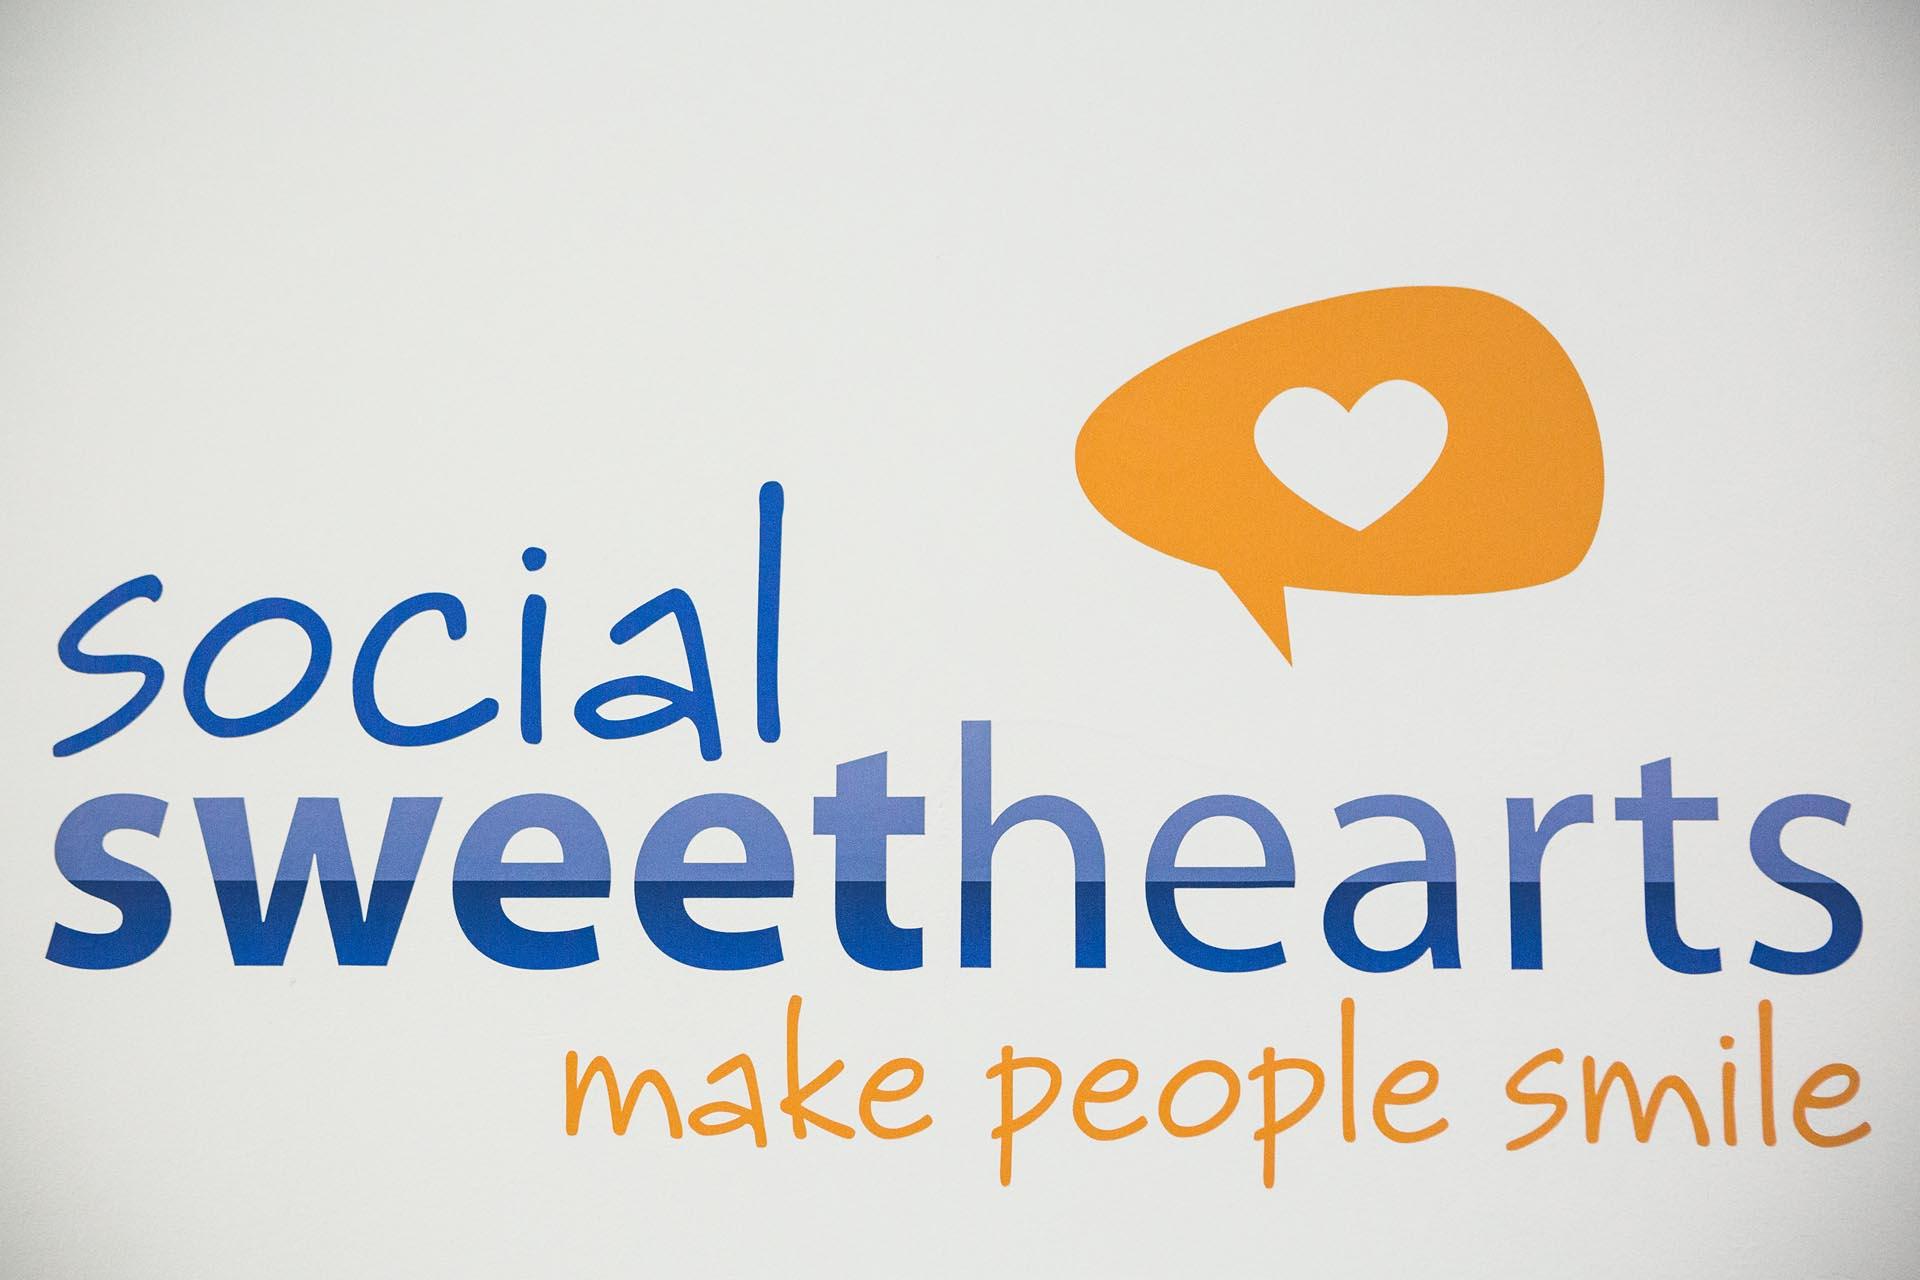 social sweethearts